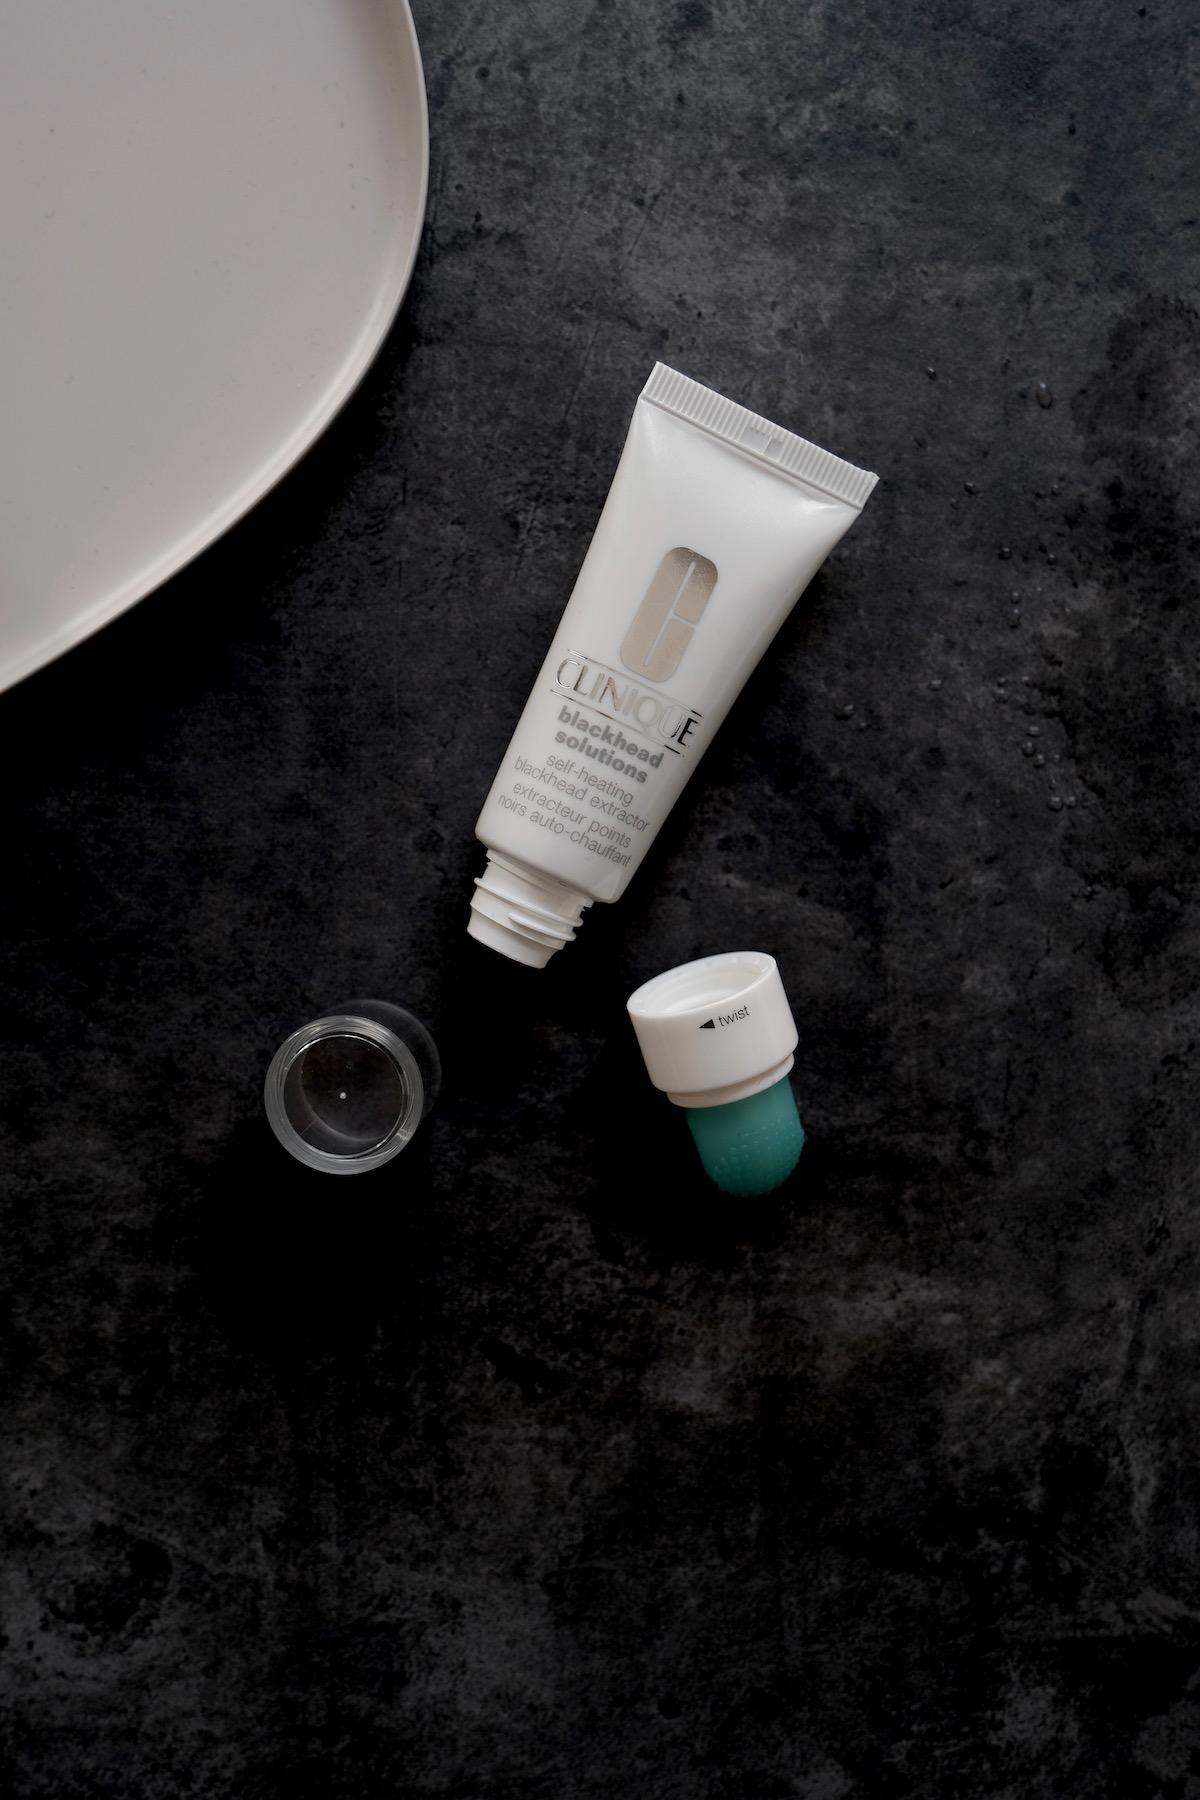 Beautyblog Elina Neumann Clinique Blackhead Solution Self-Heating Blackhead Extractor